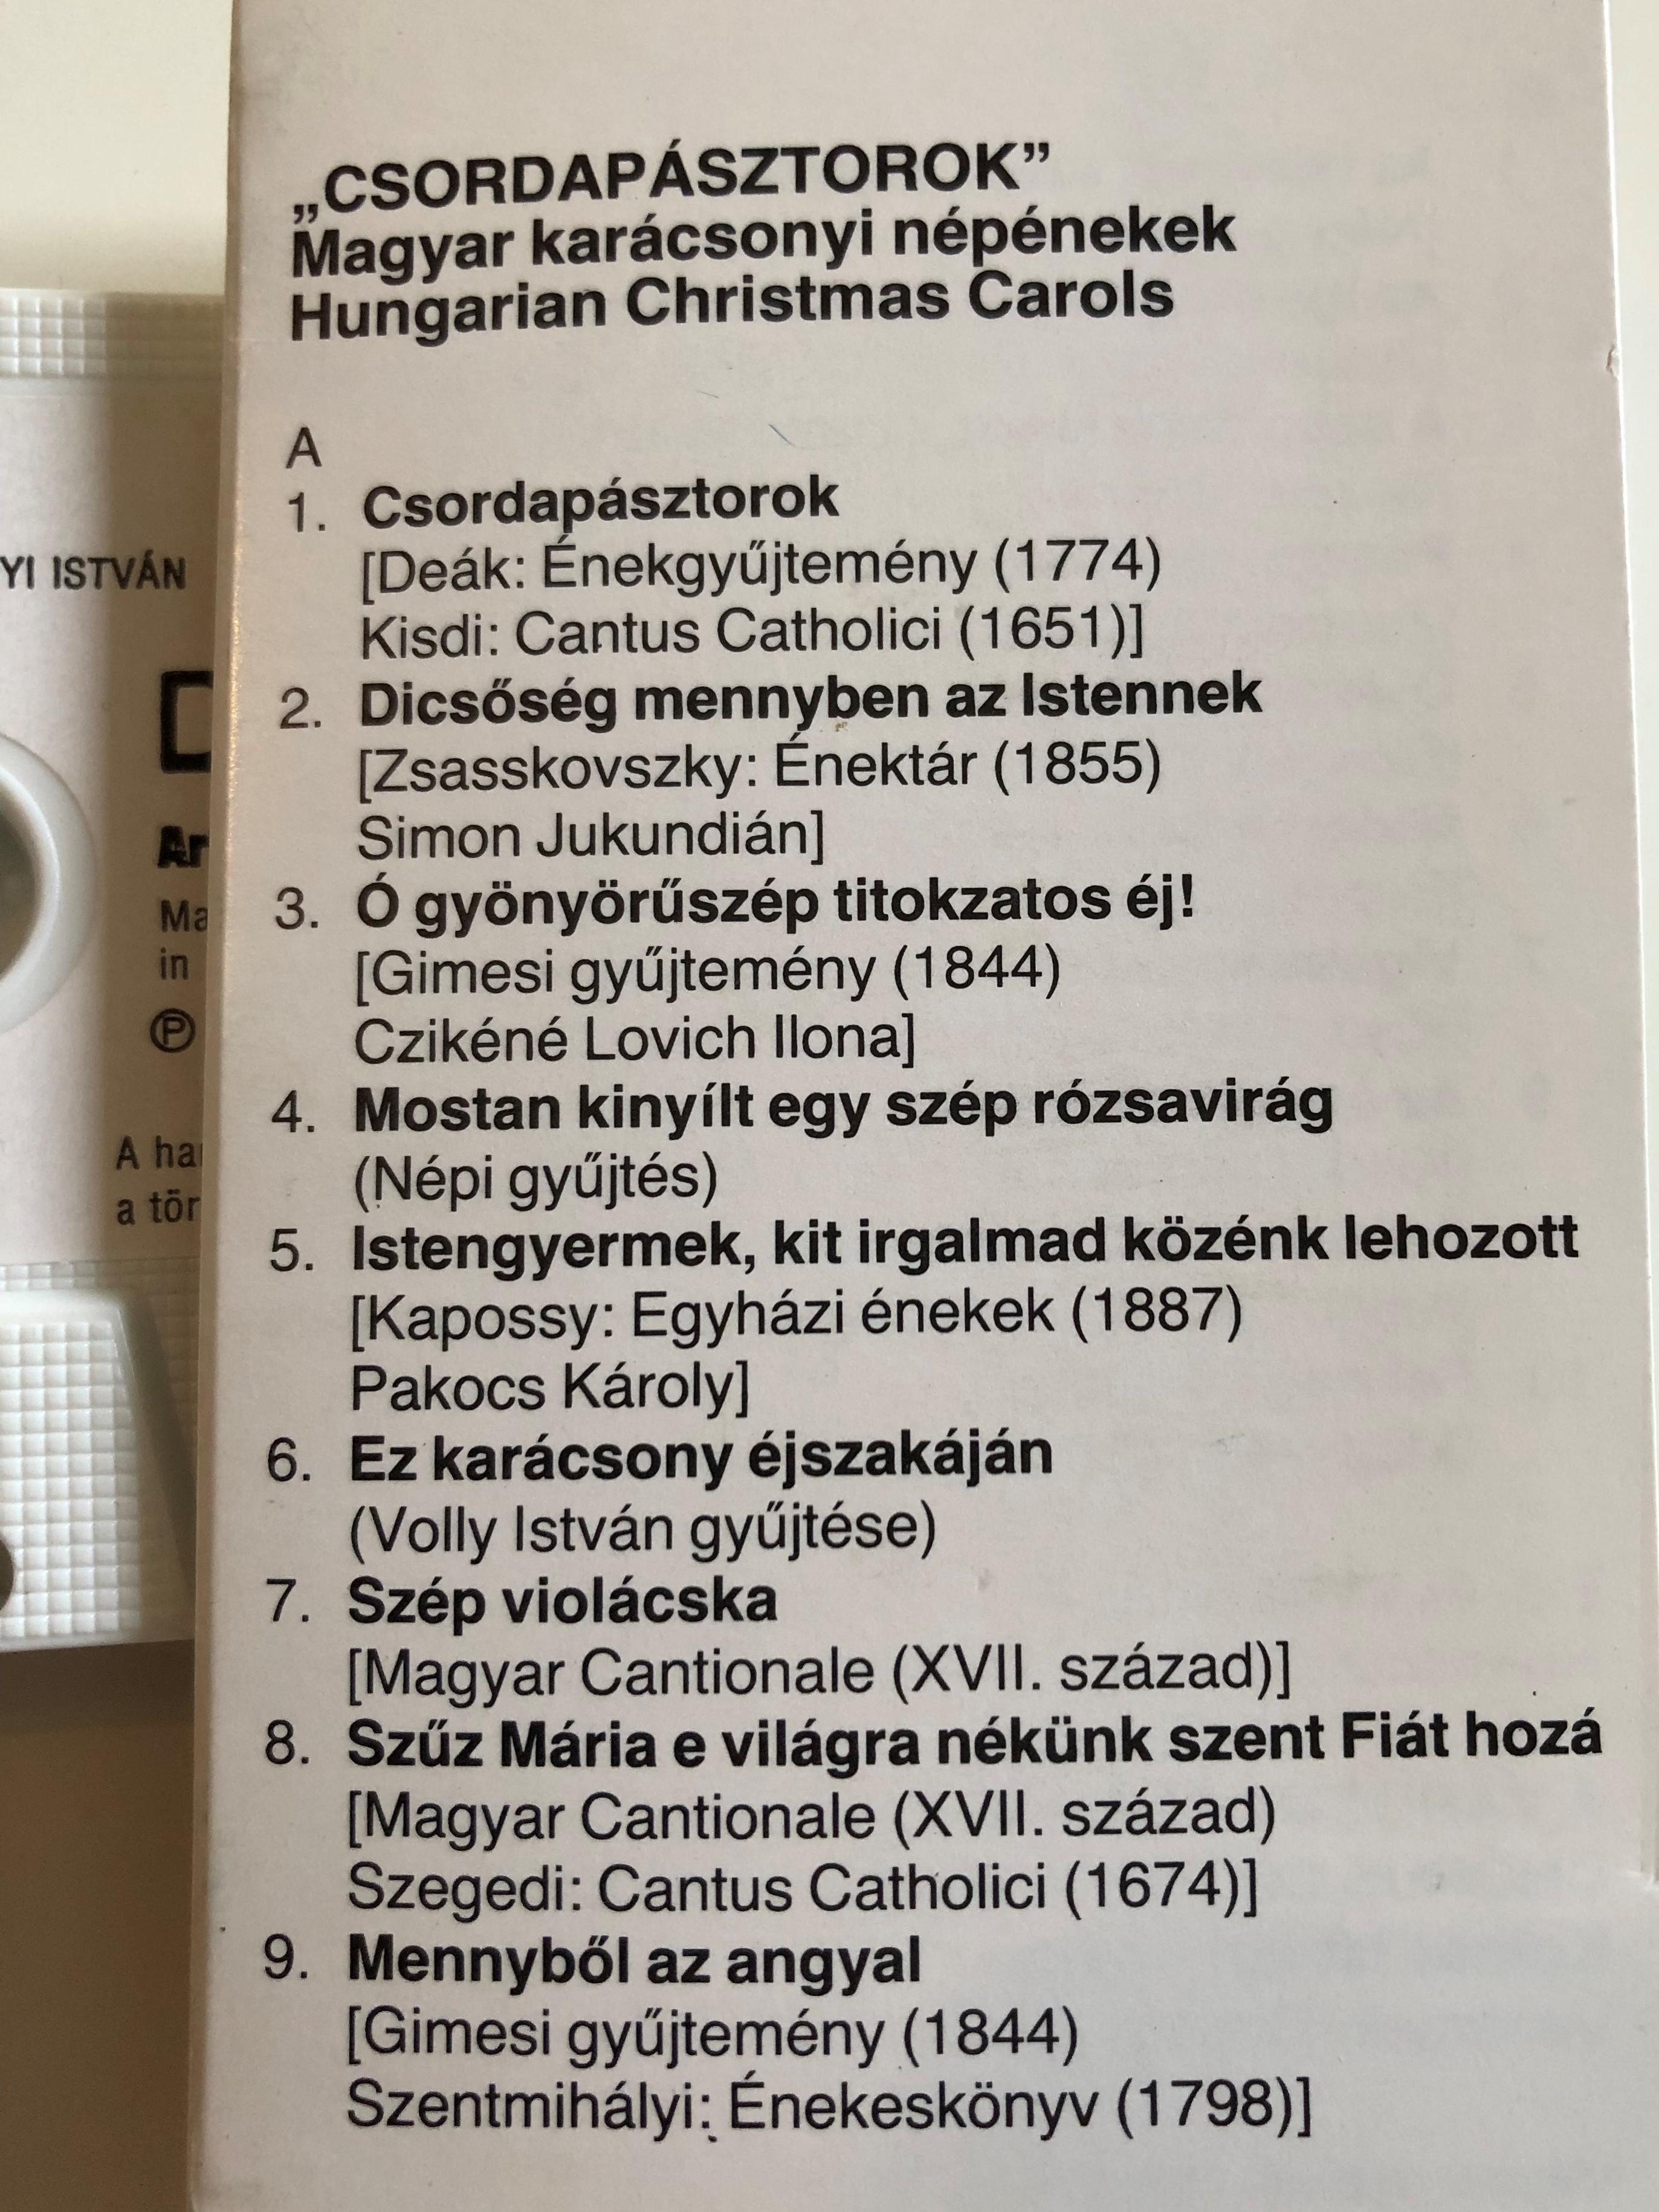 csordap-sztorok-magyar-kar-csonyi-n-p-nekek-hungarian-christmas-carols-a-v-rosmajori-katolikus-templom-nekkara-chorus-of-the-varosmajor-catholic-church-conducted-zim-nyi-istv-n-organ-3-.jpg